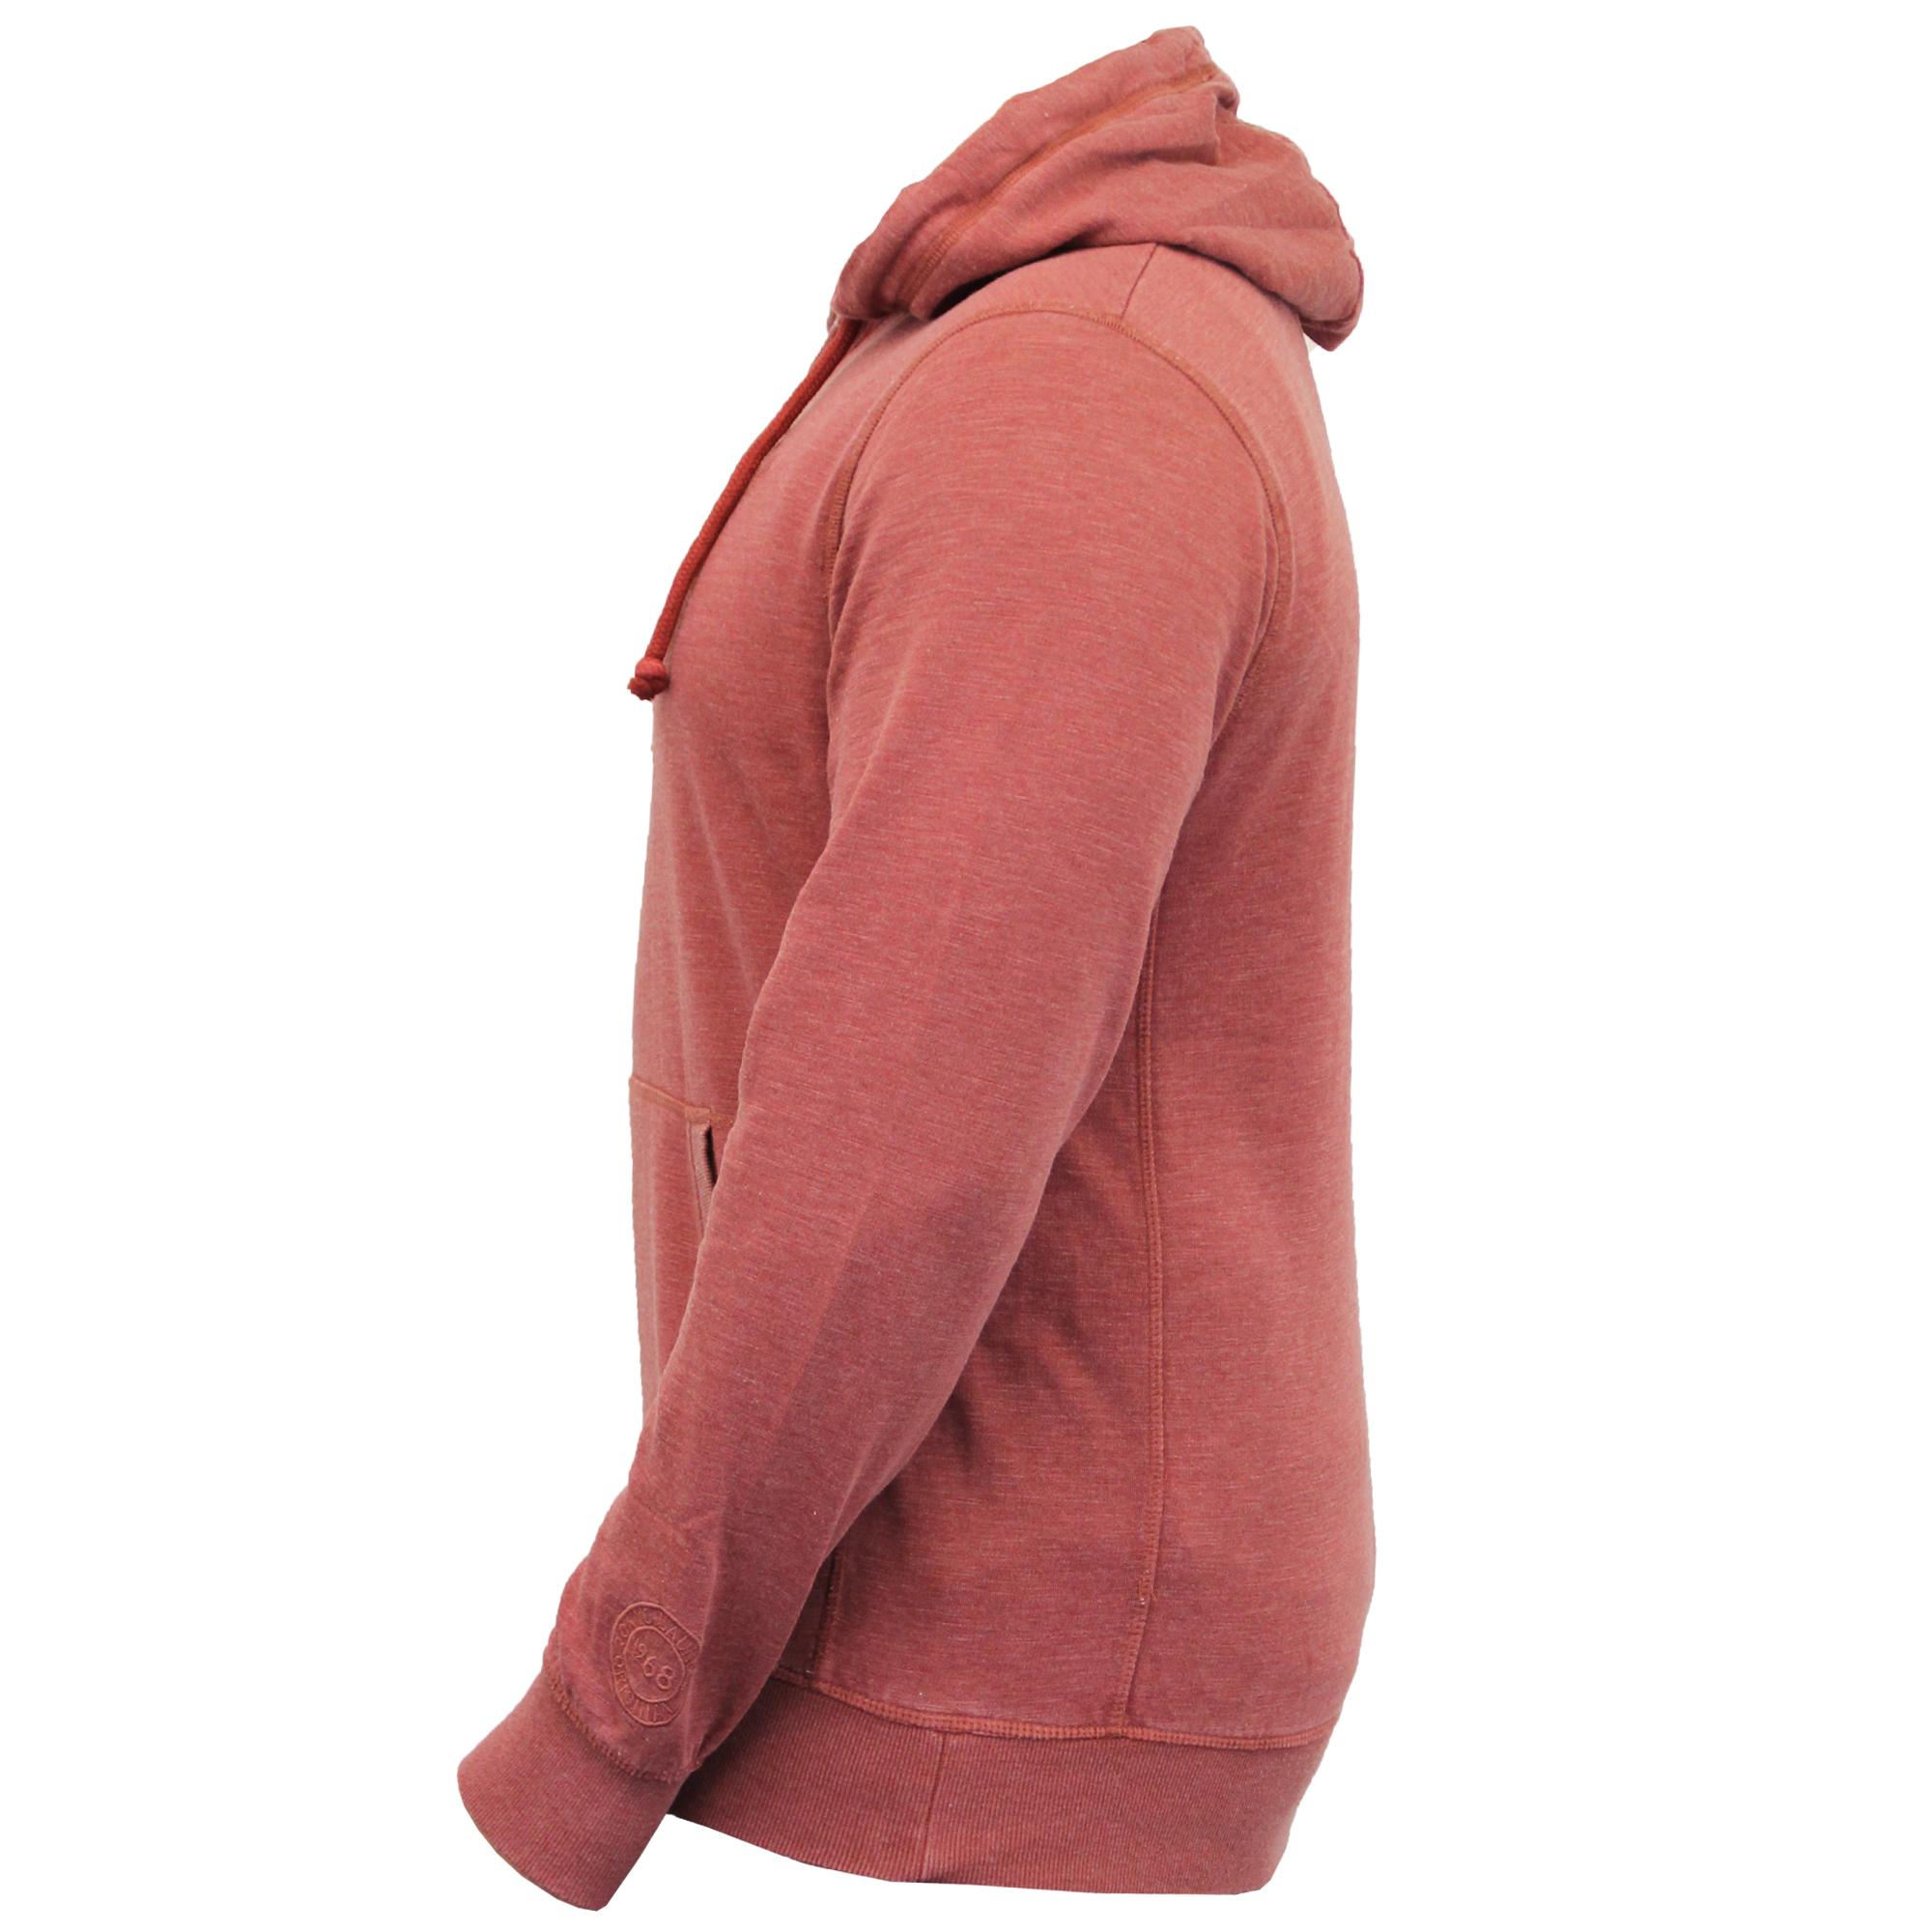 Mens-Sweatshirt-Tokyo-Laundry-Hooded-Top-Sweat-Applique-Zip-Gym-Fleece-Lined-New thumbnail 22